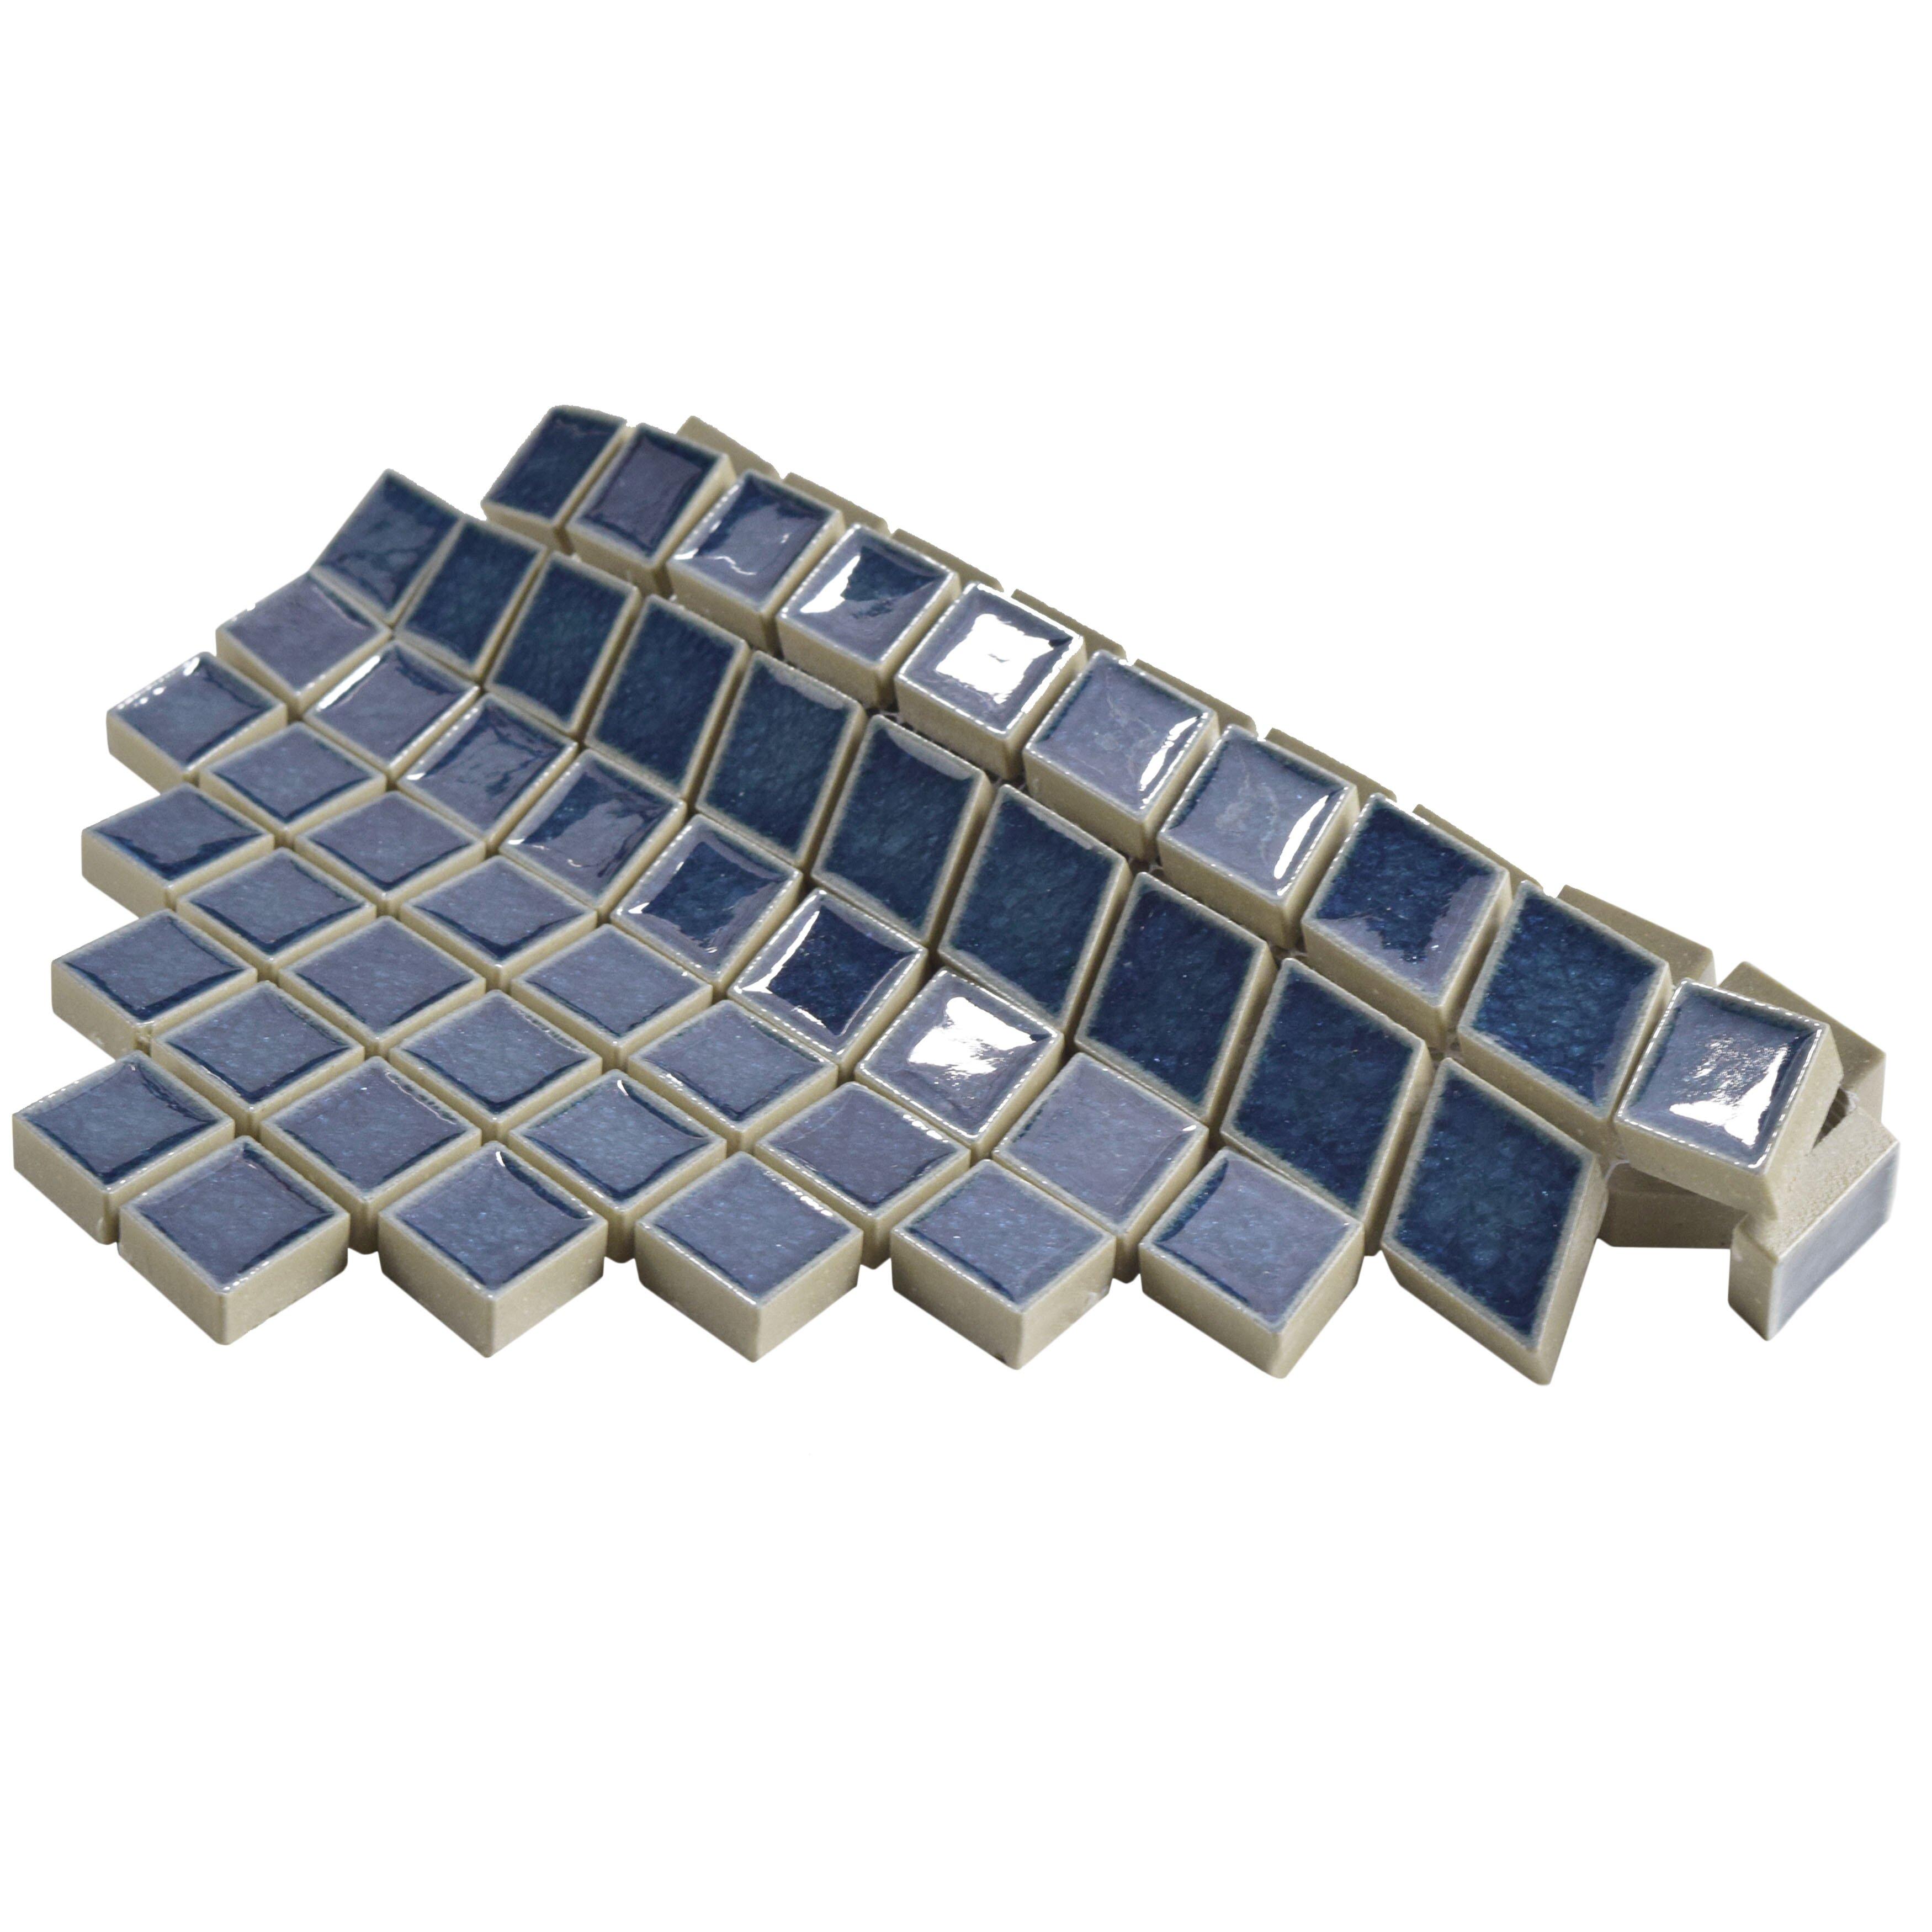 Elitetile Interval 1 X 2 Ceramic Mosaic Wall Tile In Diamond Azure Blue Wayfair